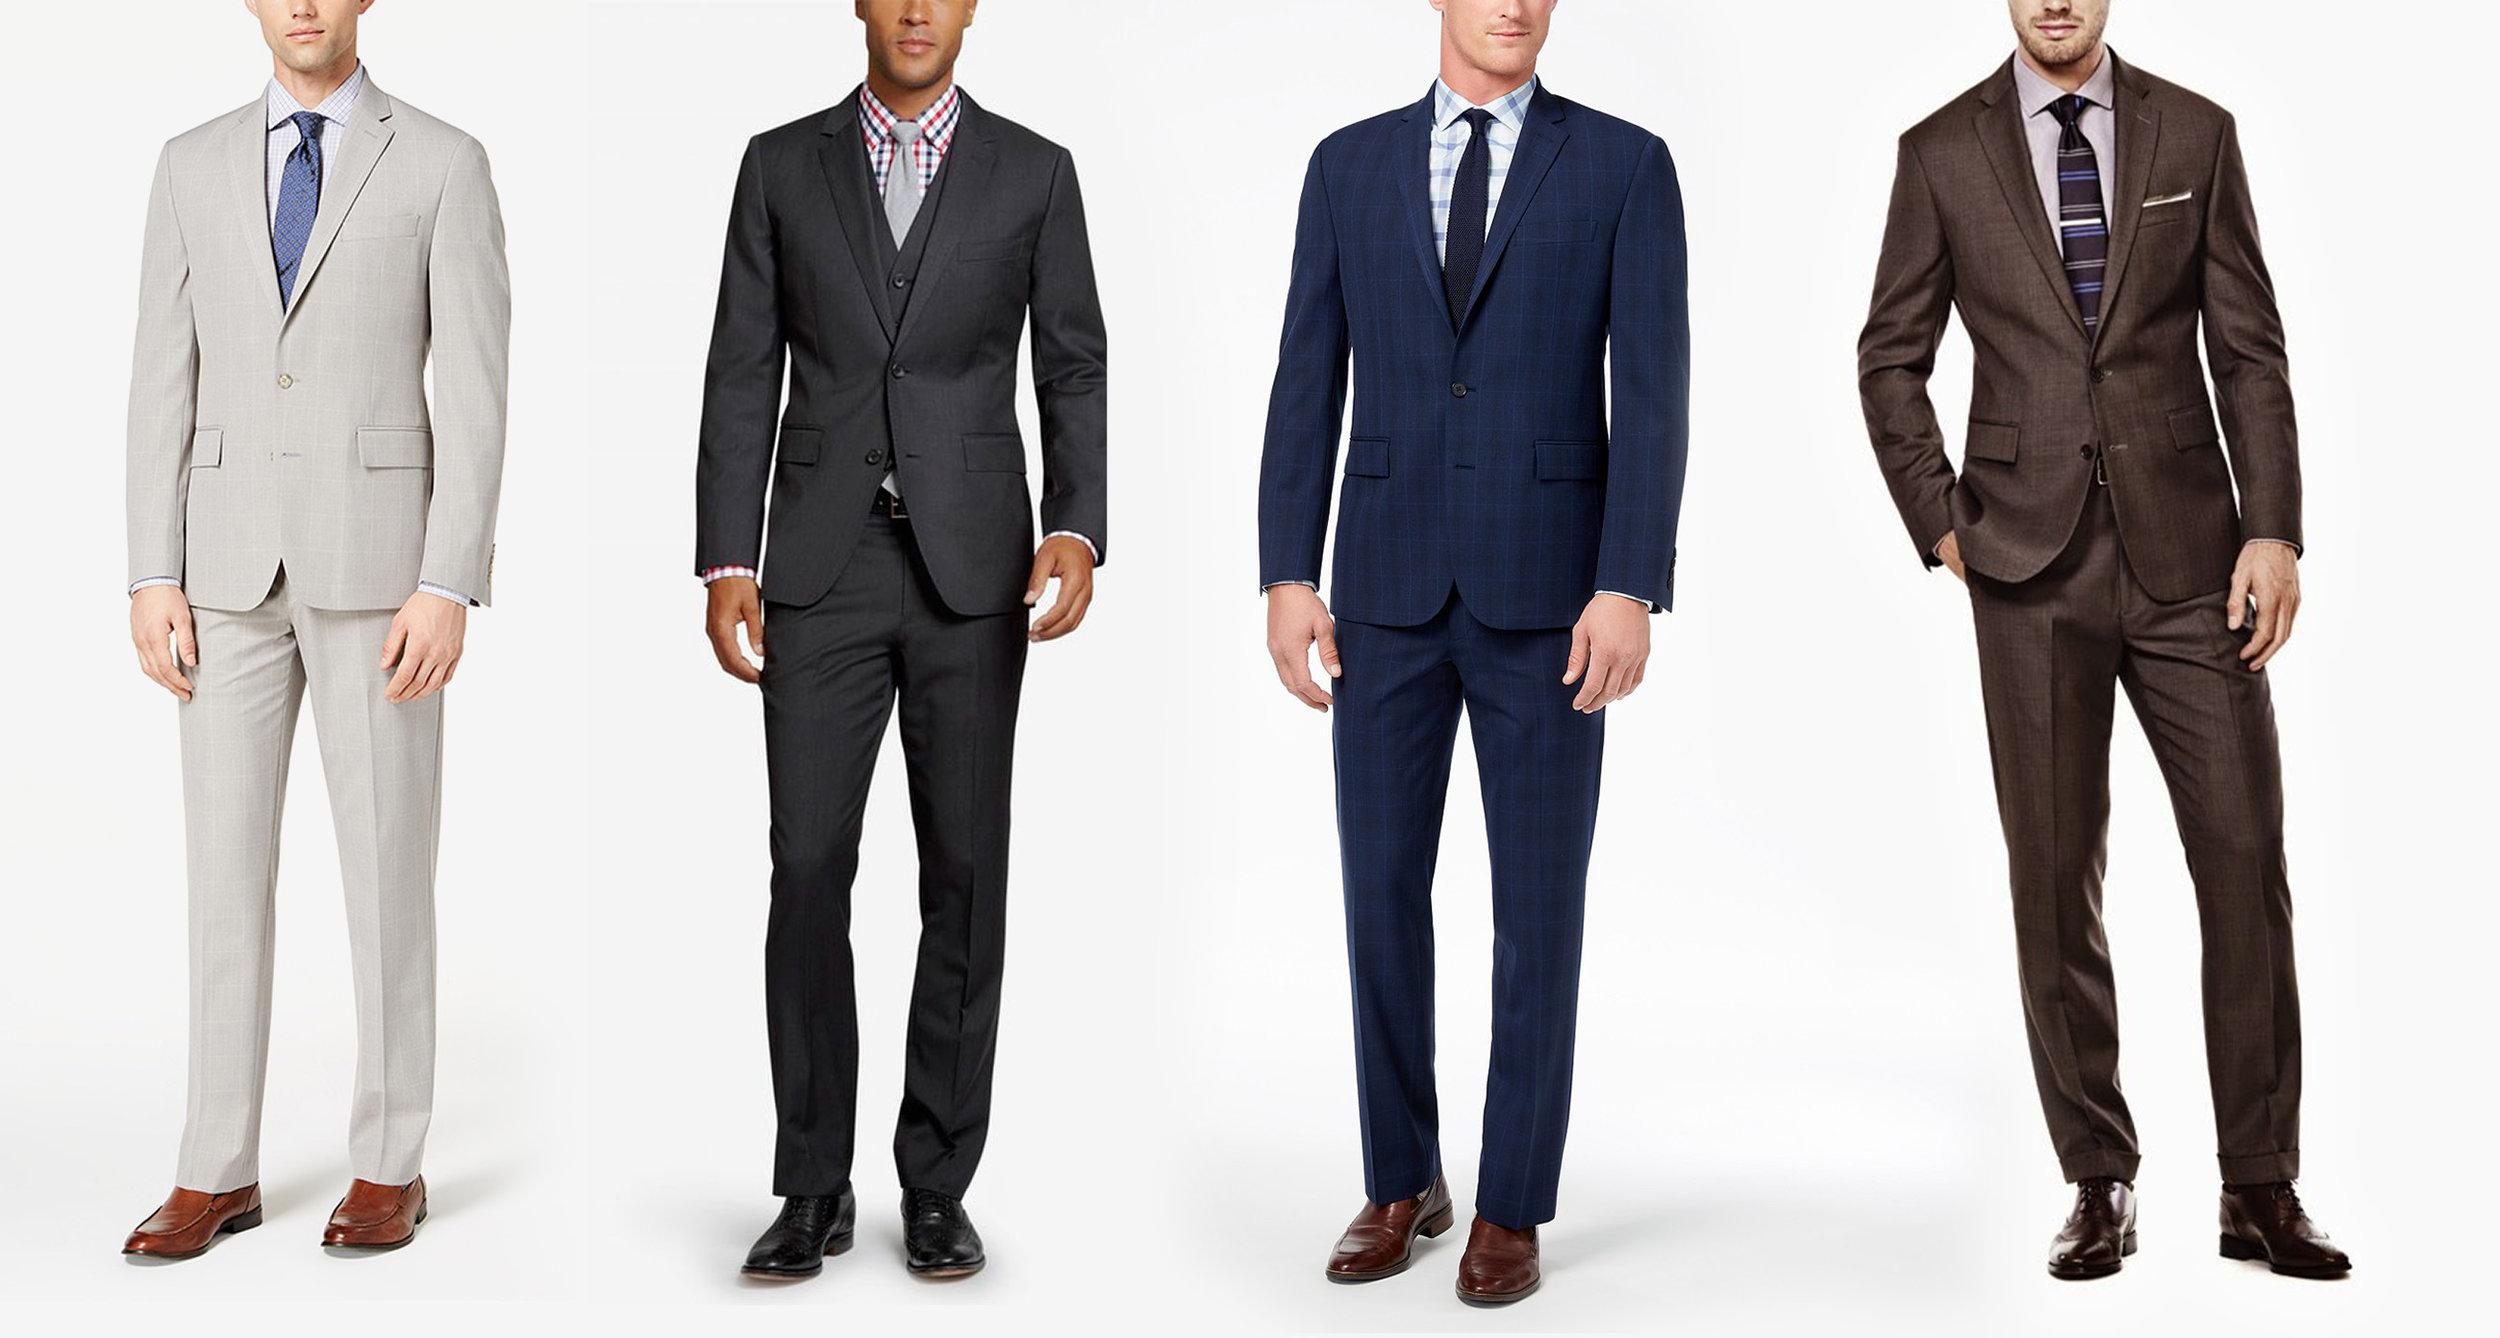 SRA-RSD-suit-sets.jpg